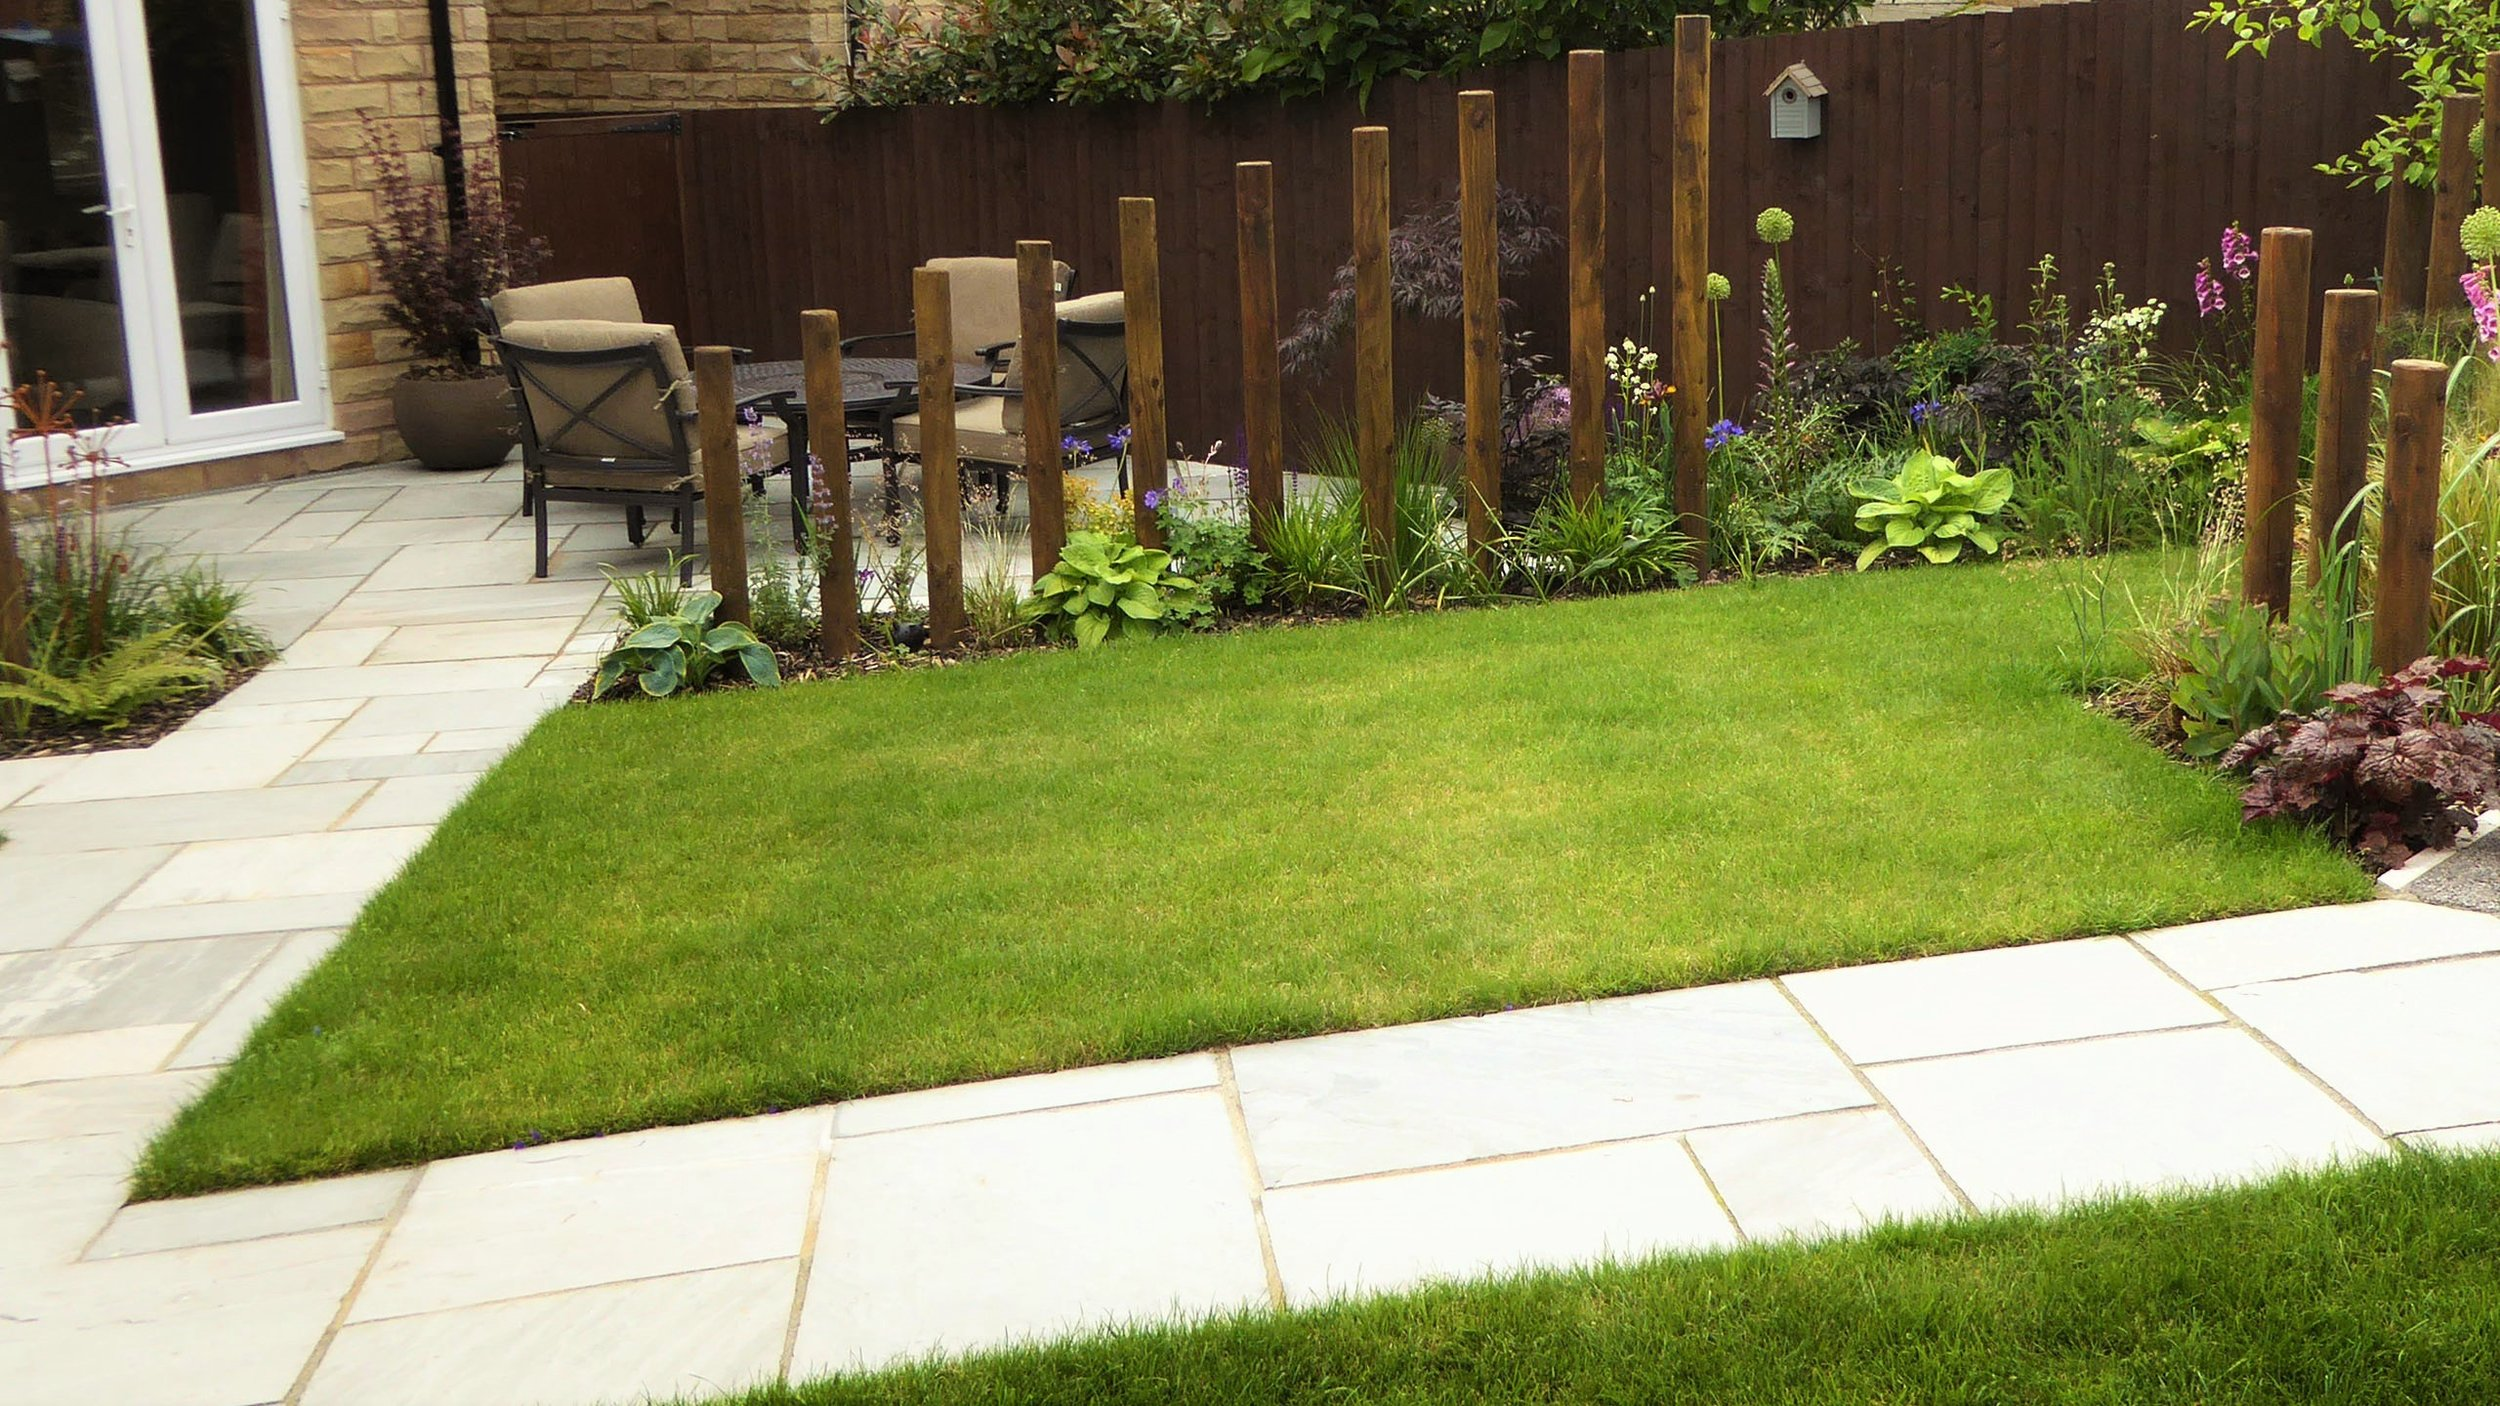 gardendesignbillinge (10).jpg